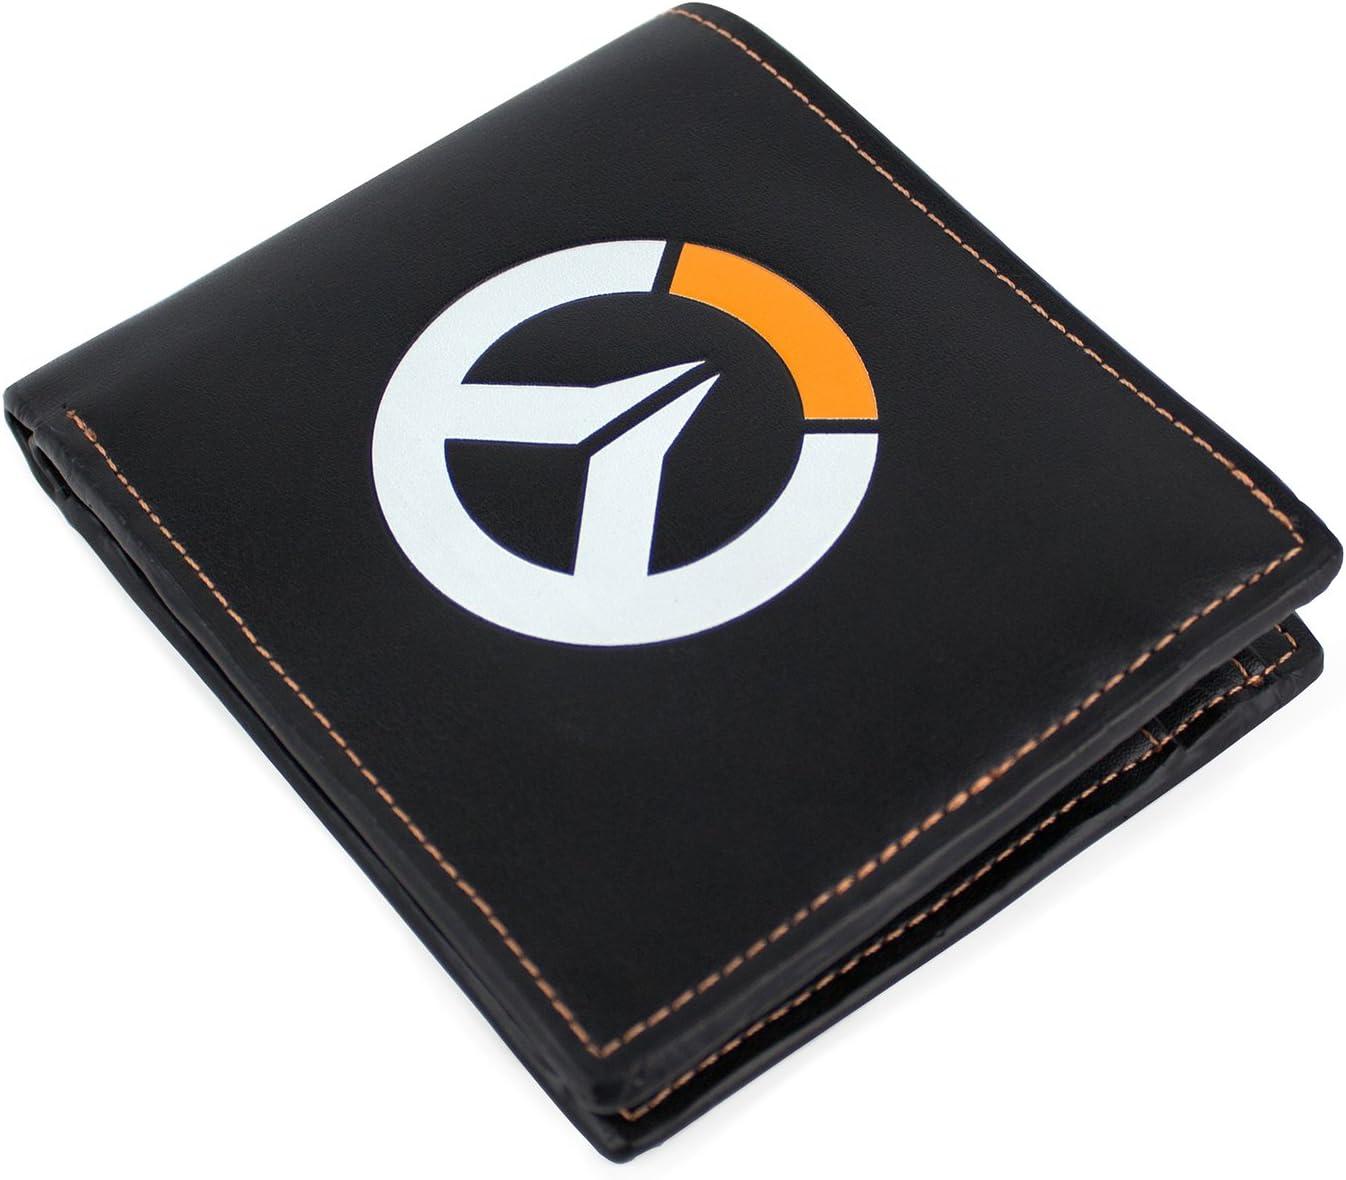 Overwatch OVERWATCH Logo Faux Leather Tri-Fold Monedero 12 Centimeters Negro (Black)